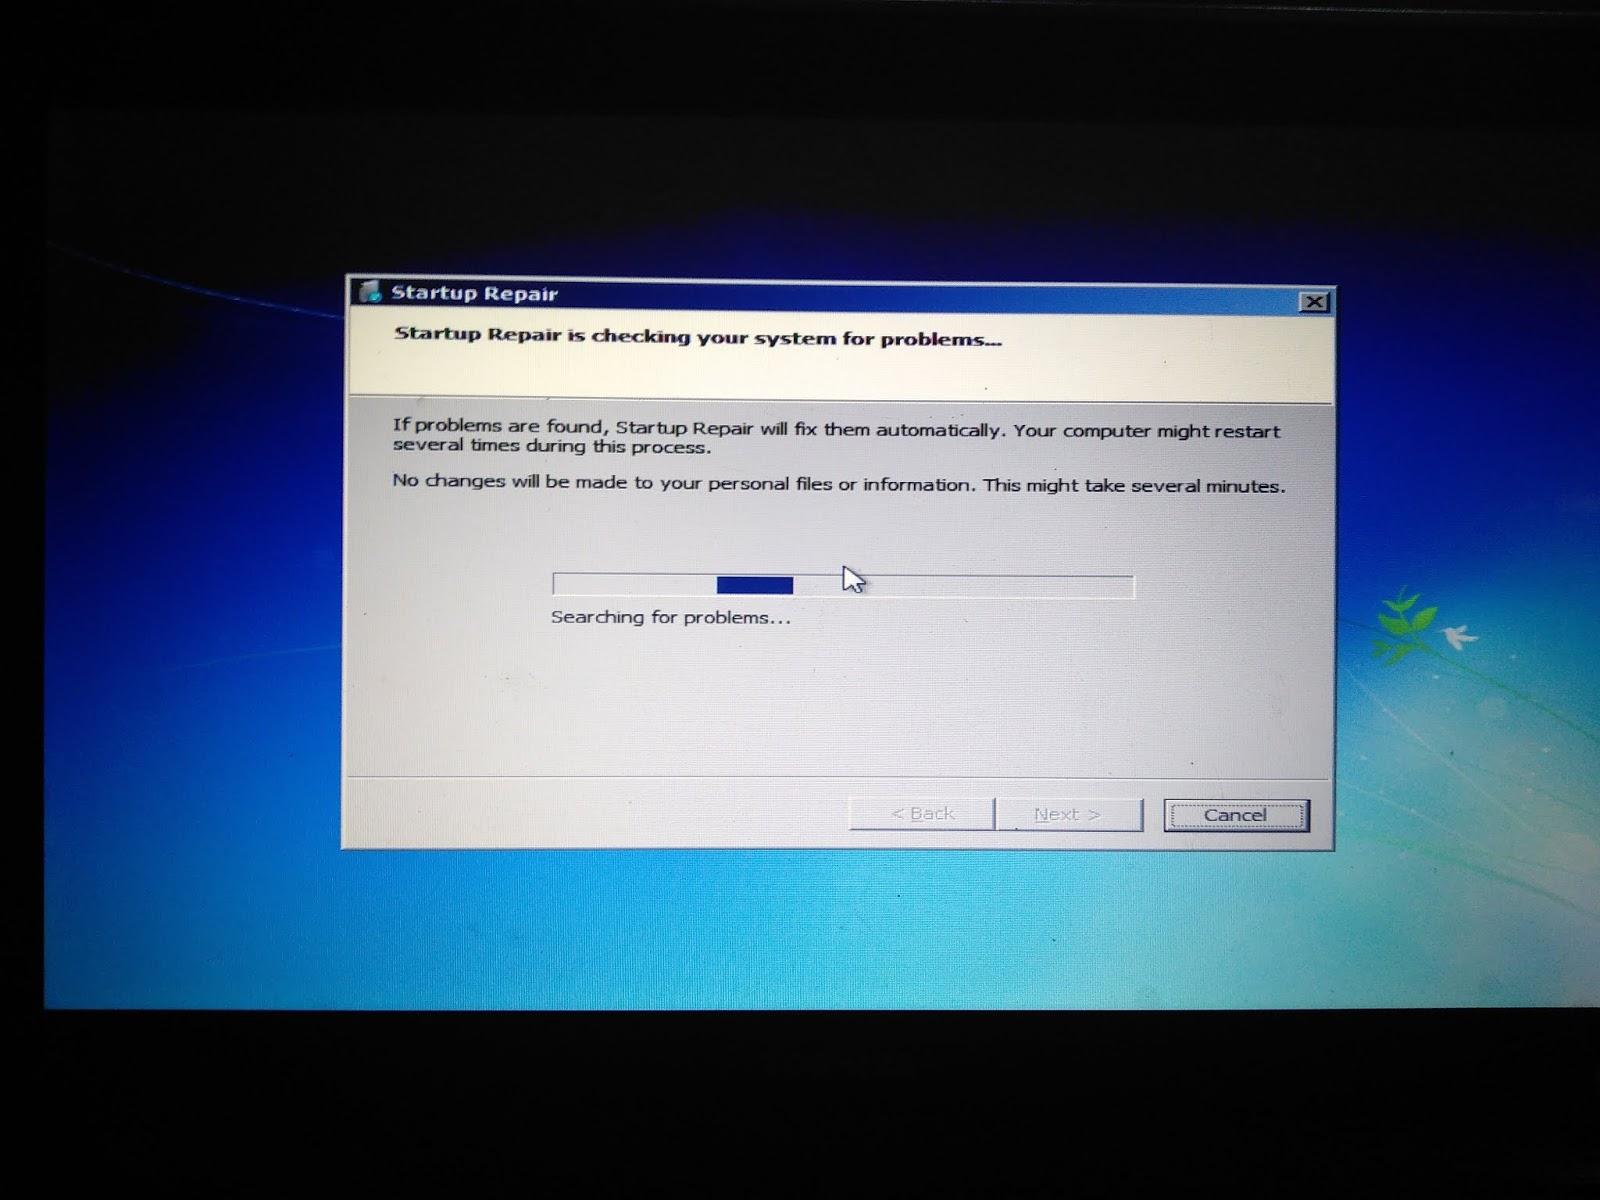 Ciri Umum Tanda Hardisk Komputer Laptop  Sudah Lemah Lanjut Usia